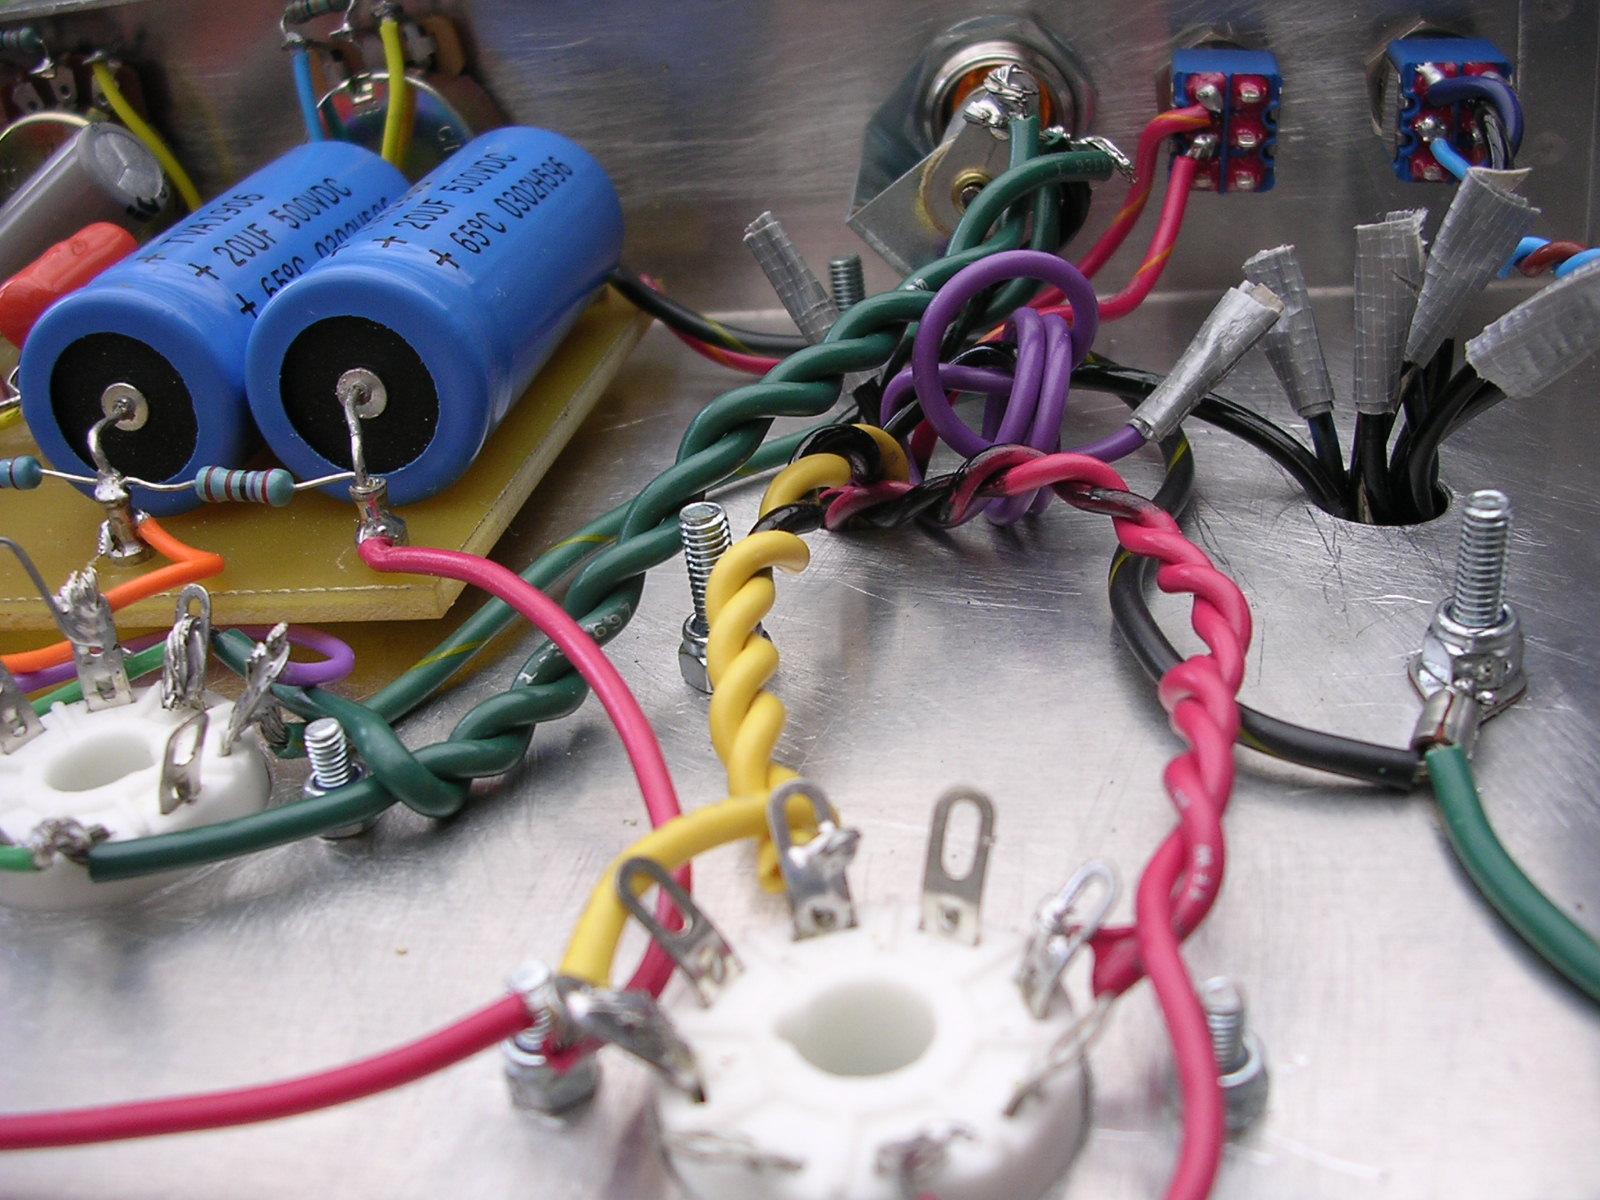 Wiring Diagram In Addition Guitar Speaker Cab Wiring Additionally